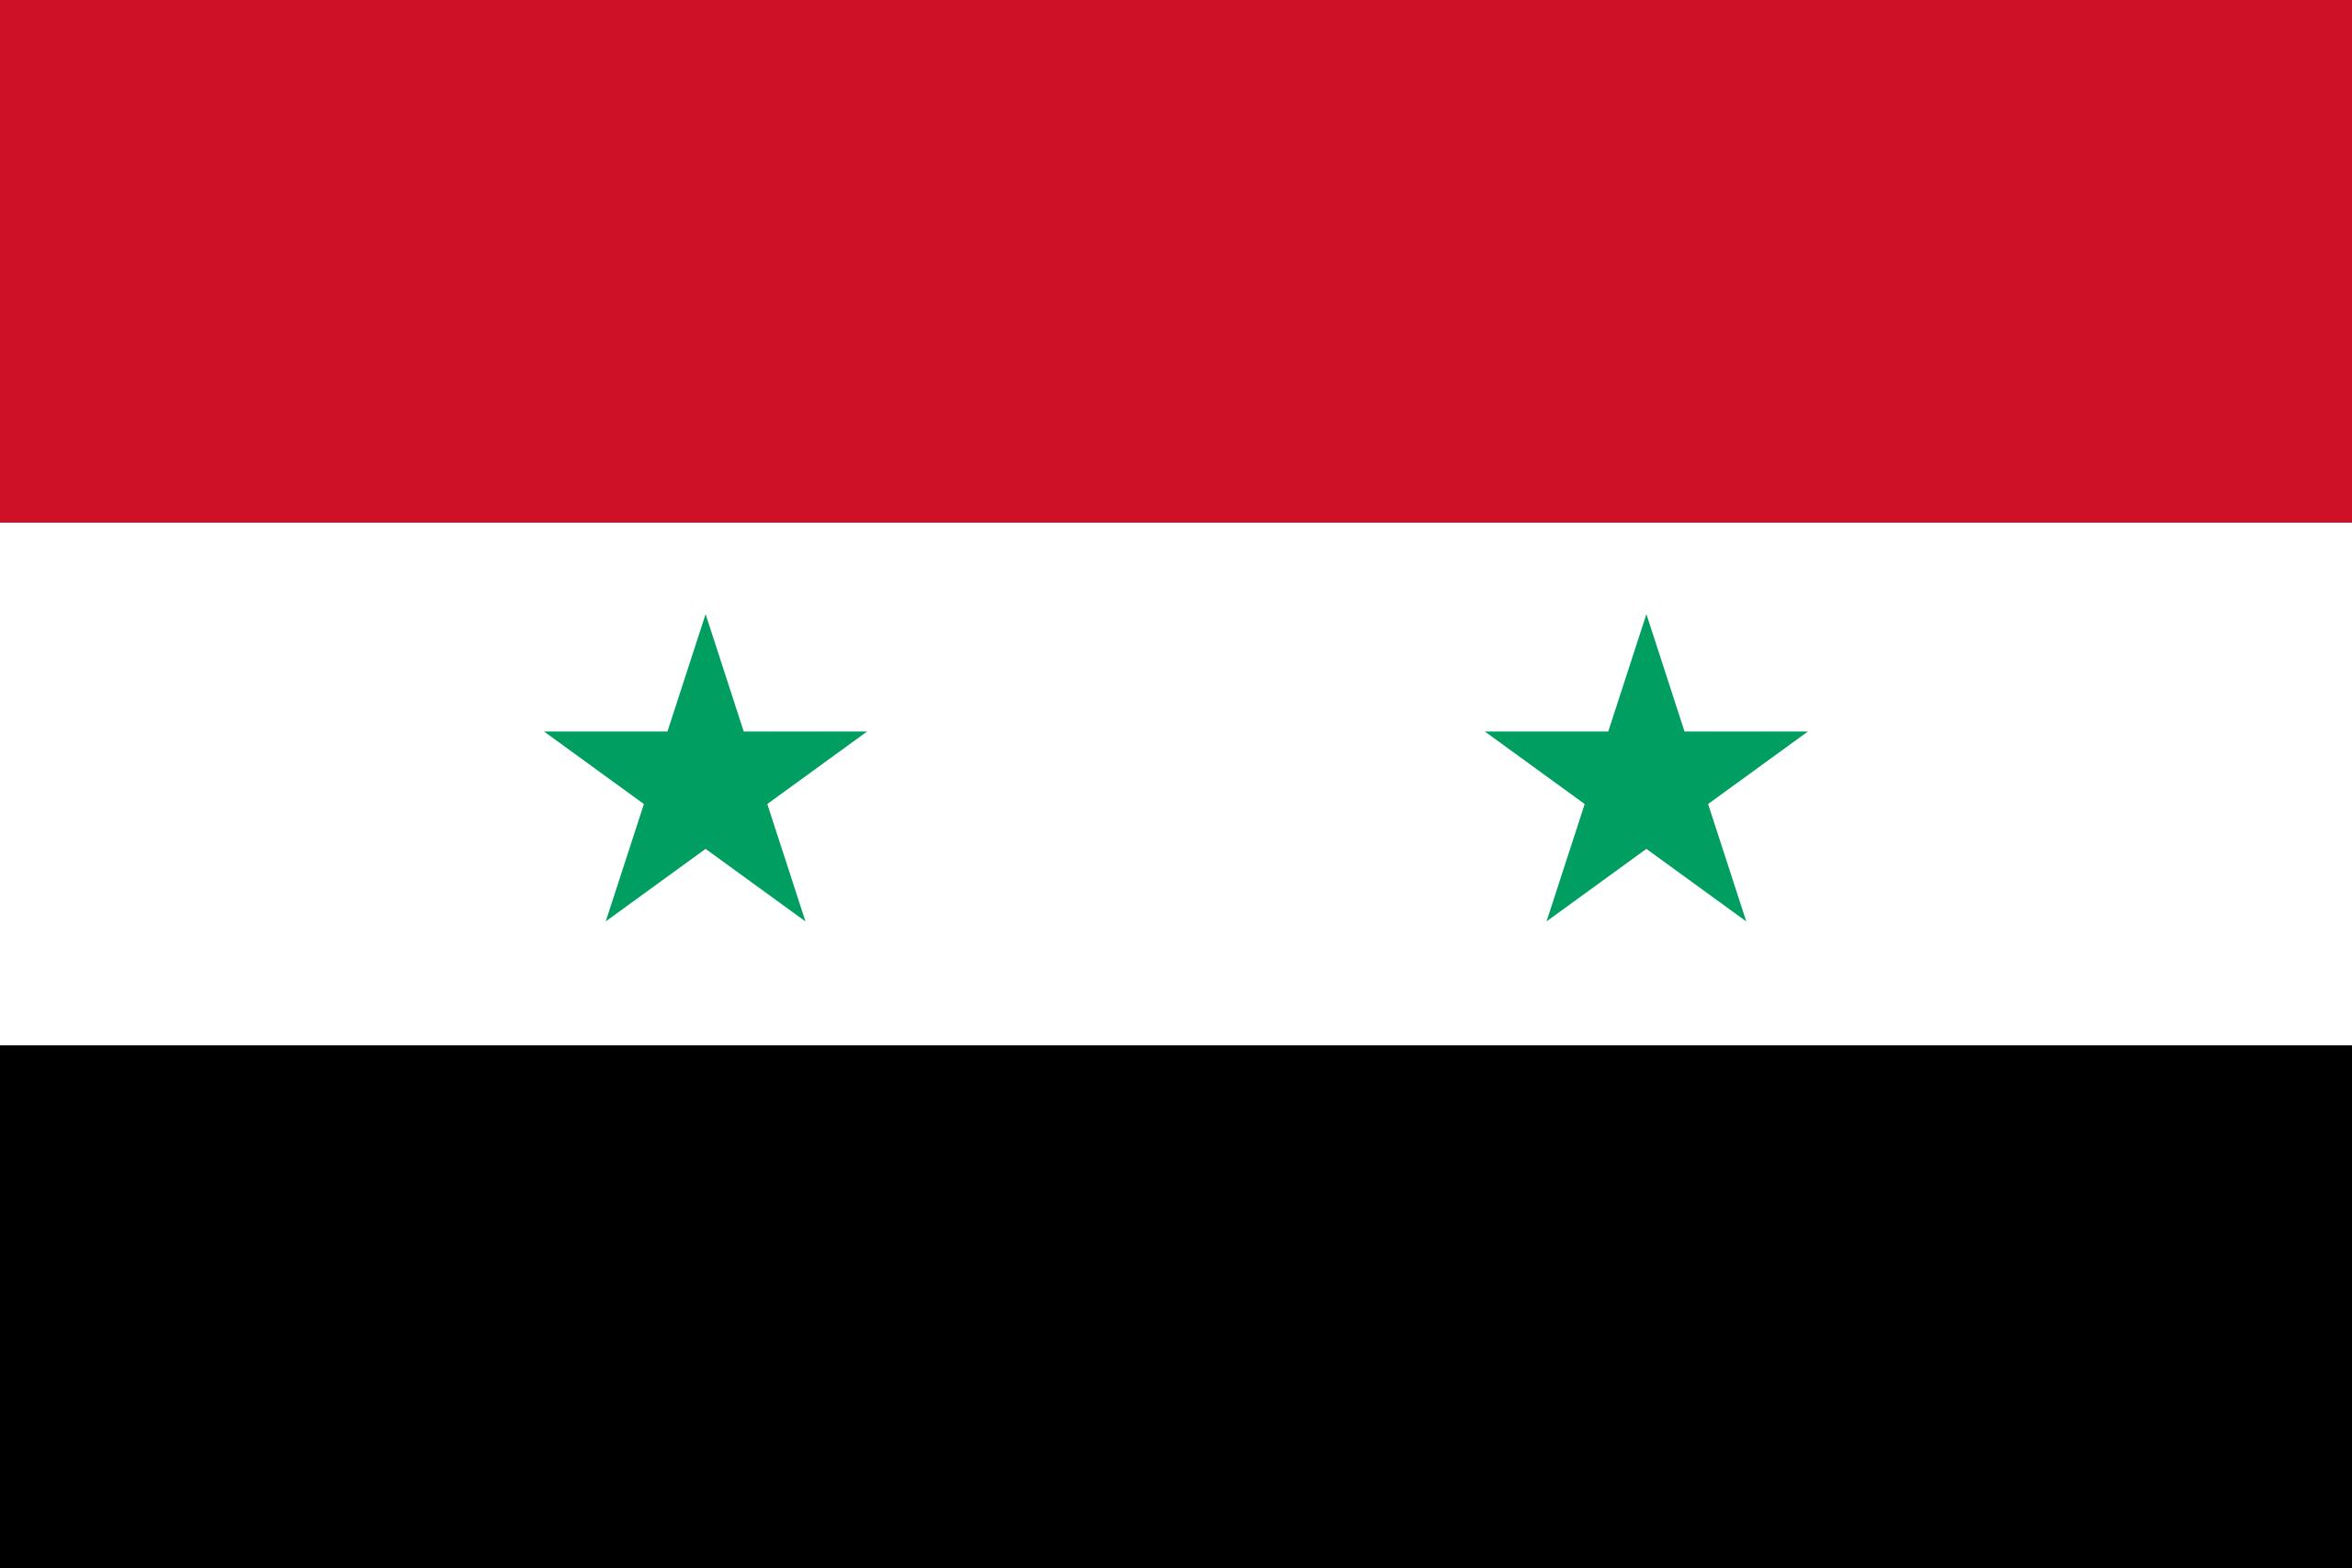 siria, 国家, 会徽, 徽标, 符号 - 高清壁纸 - 教授-falken.com